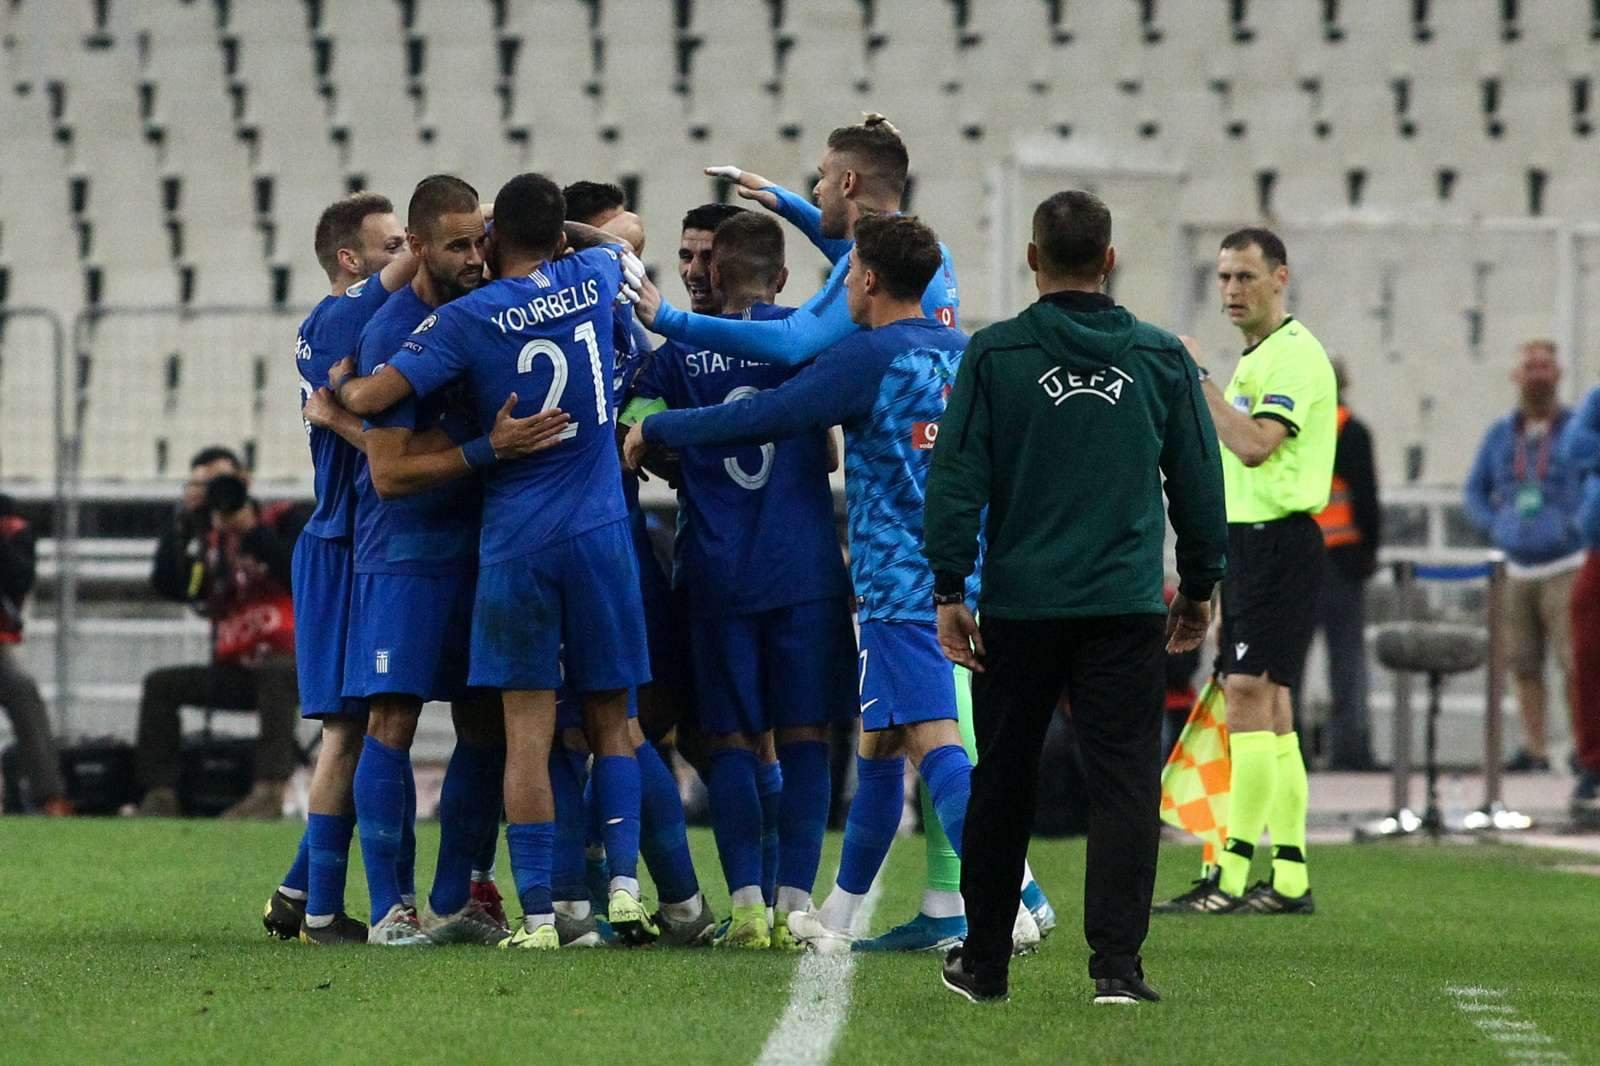 Косово – Греция: прогноз на матч отборочного цикла чемпионата мира-2022 - 5 сентября 2021